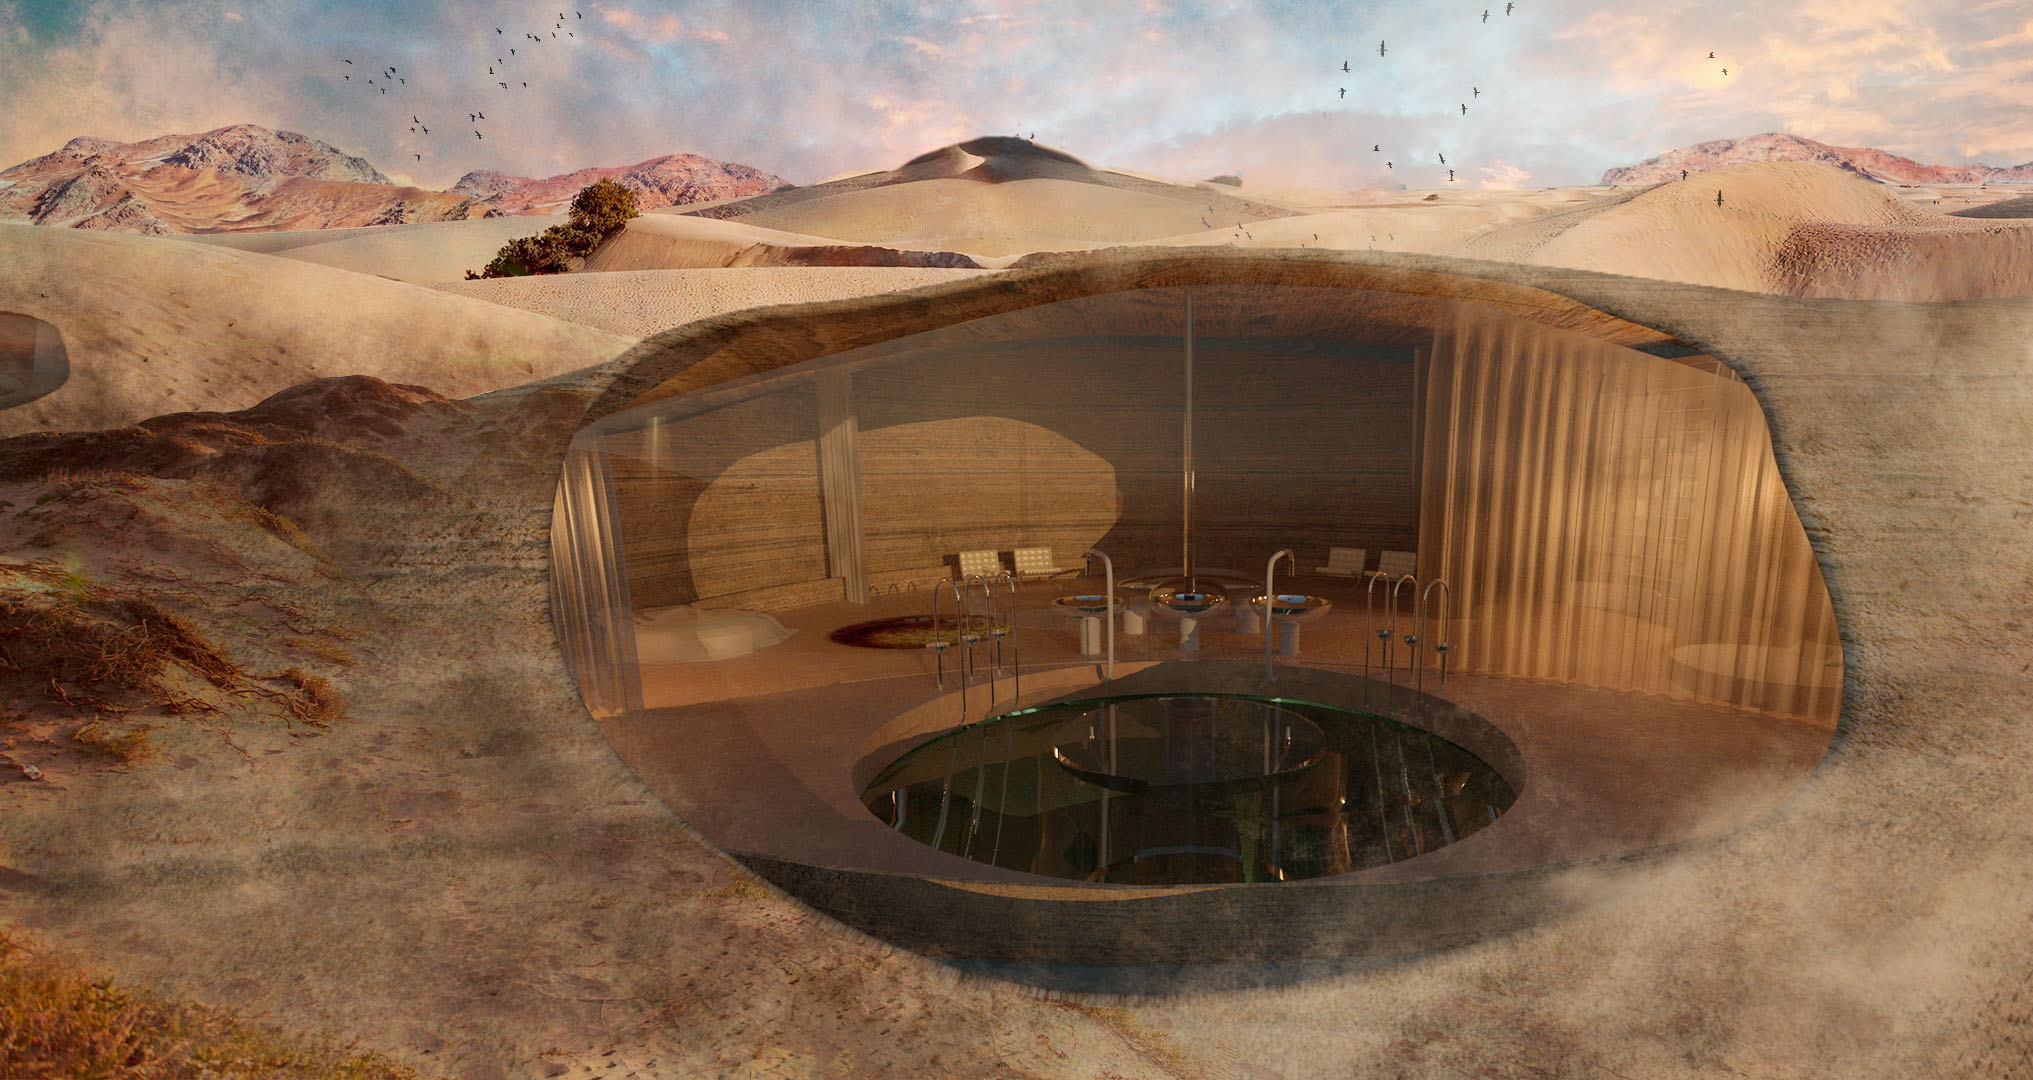 atelier aitken sand dune home biotechnology